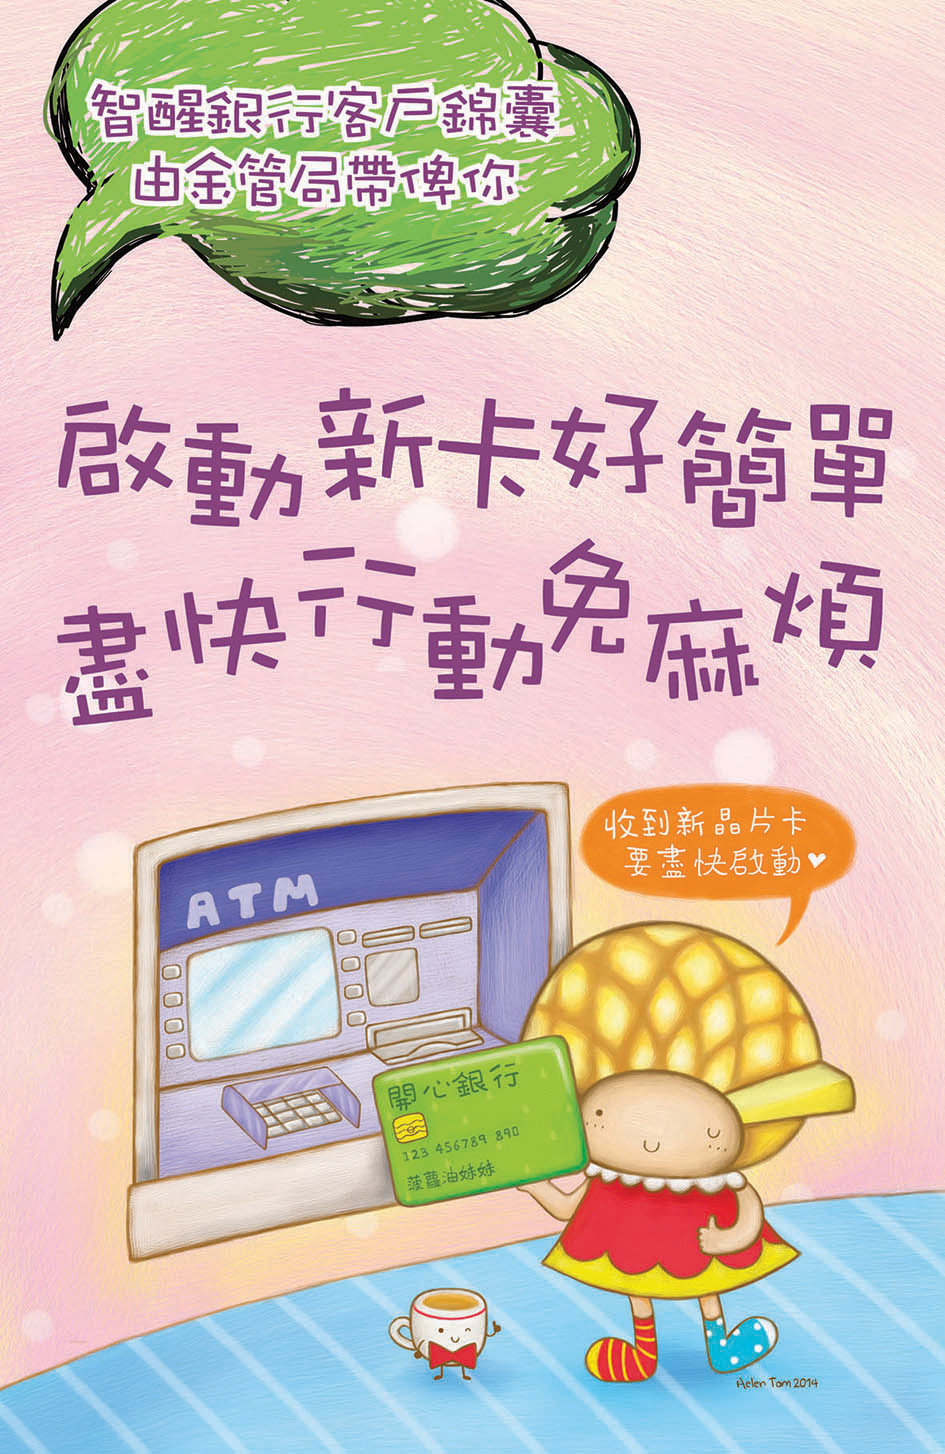 Hong Kong Monetary Authority - Consumer Education Programme